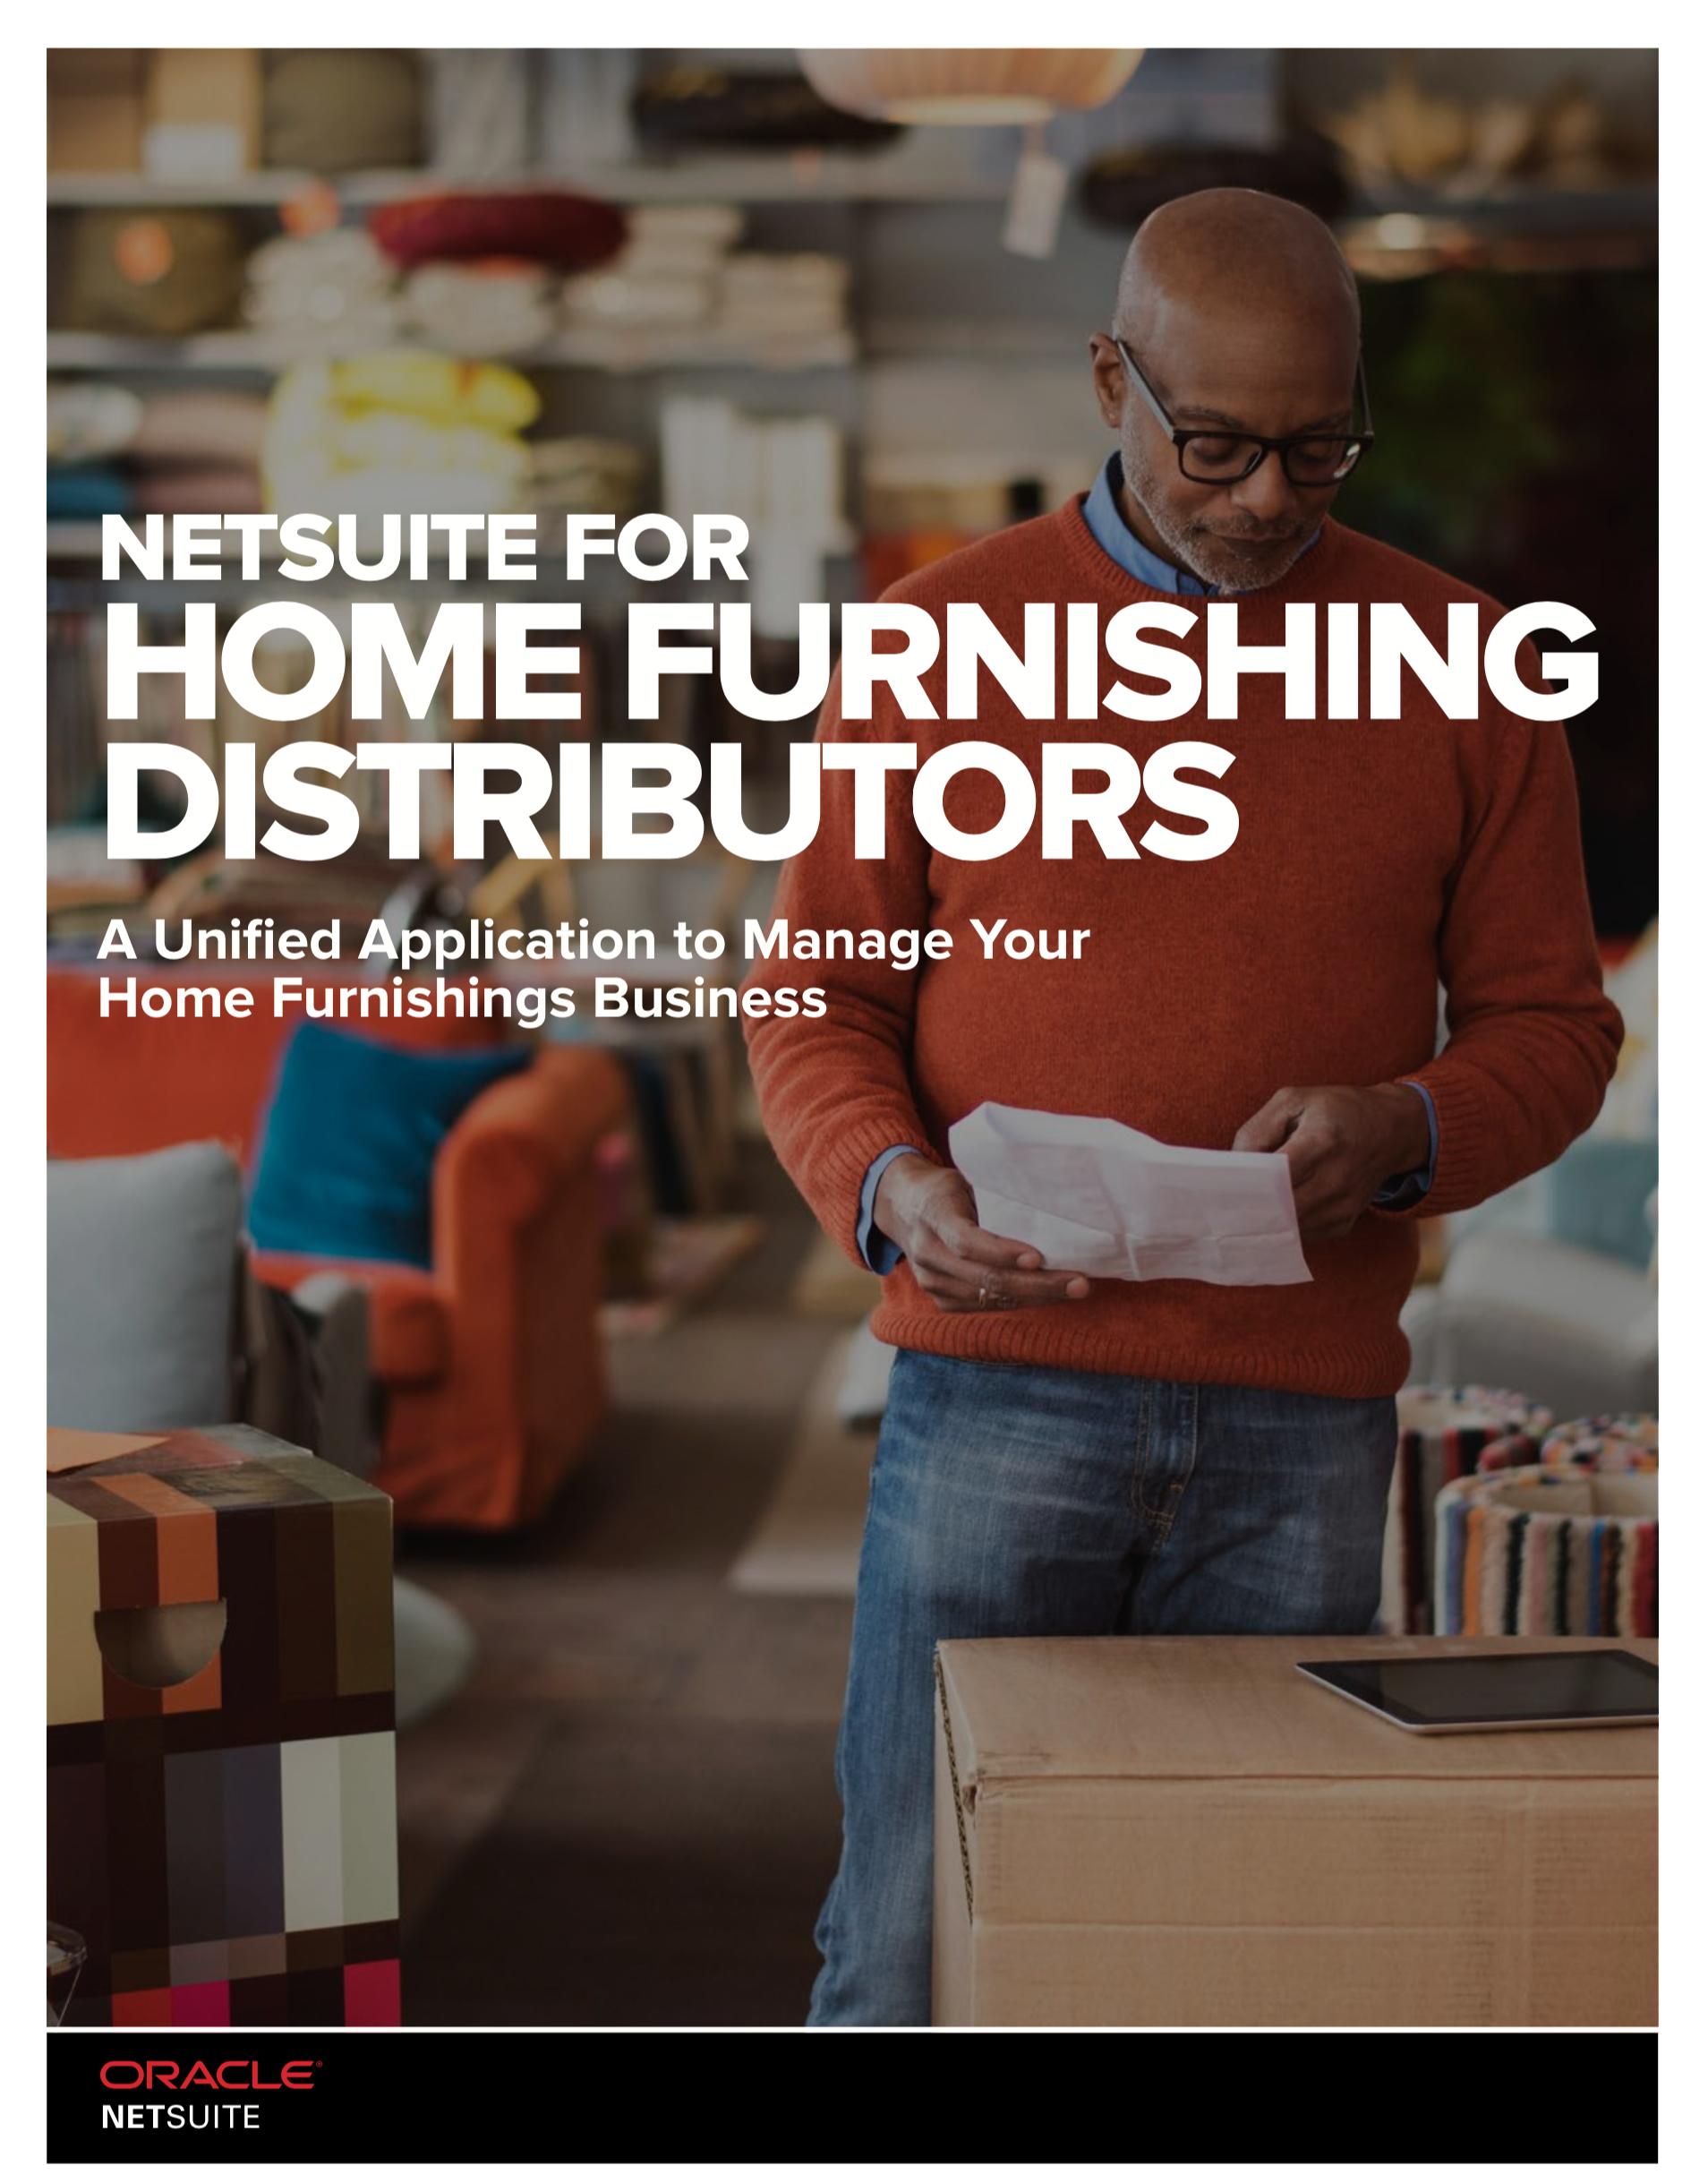 NetSuite for Home Furnishing Distributors